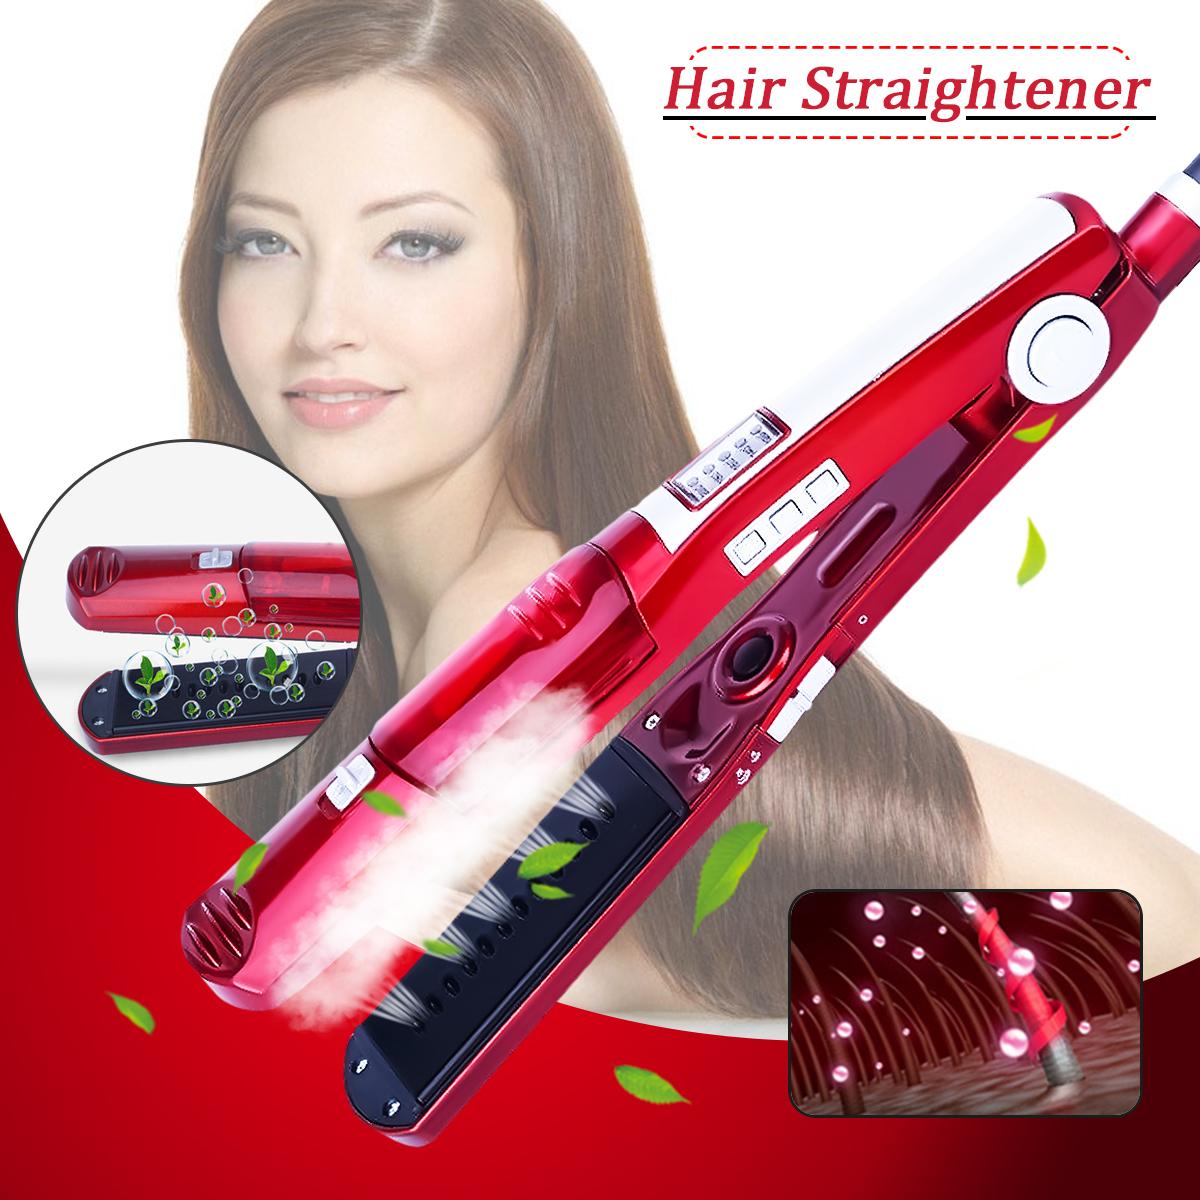 Professional Ceramic Vapor Steam Hair Straightener Brush Flat Iron Fast Heating - Hair Styling Tools